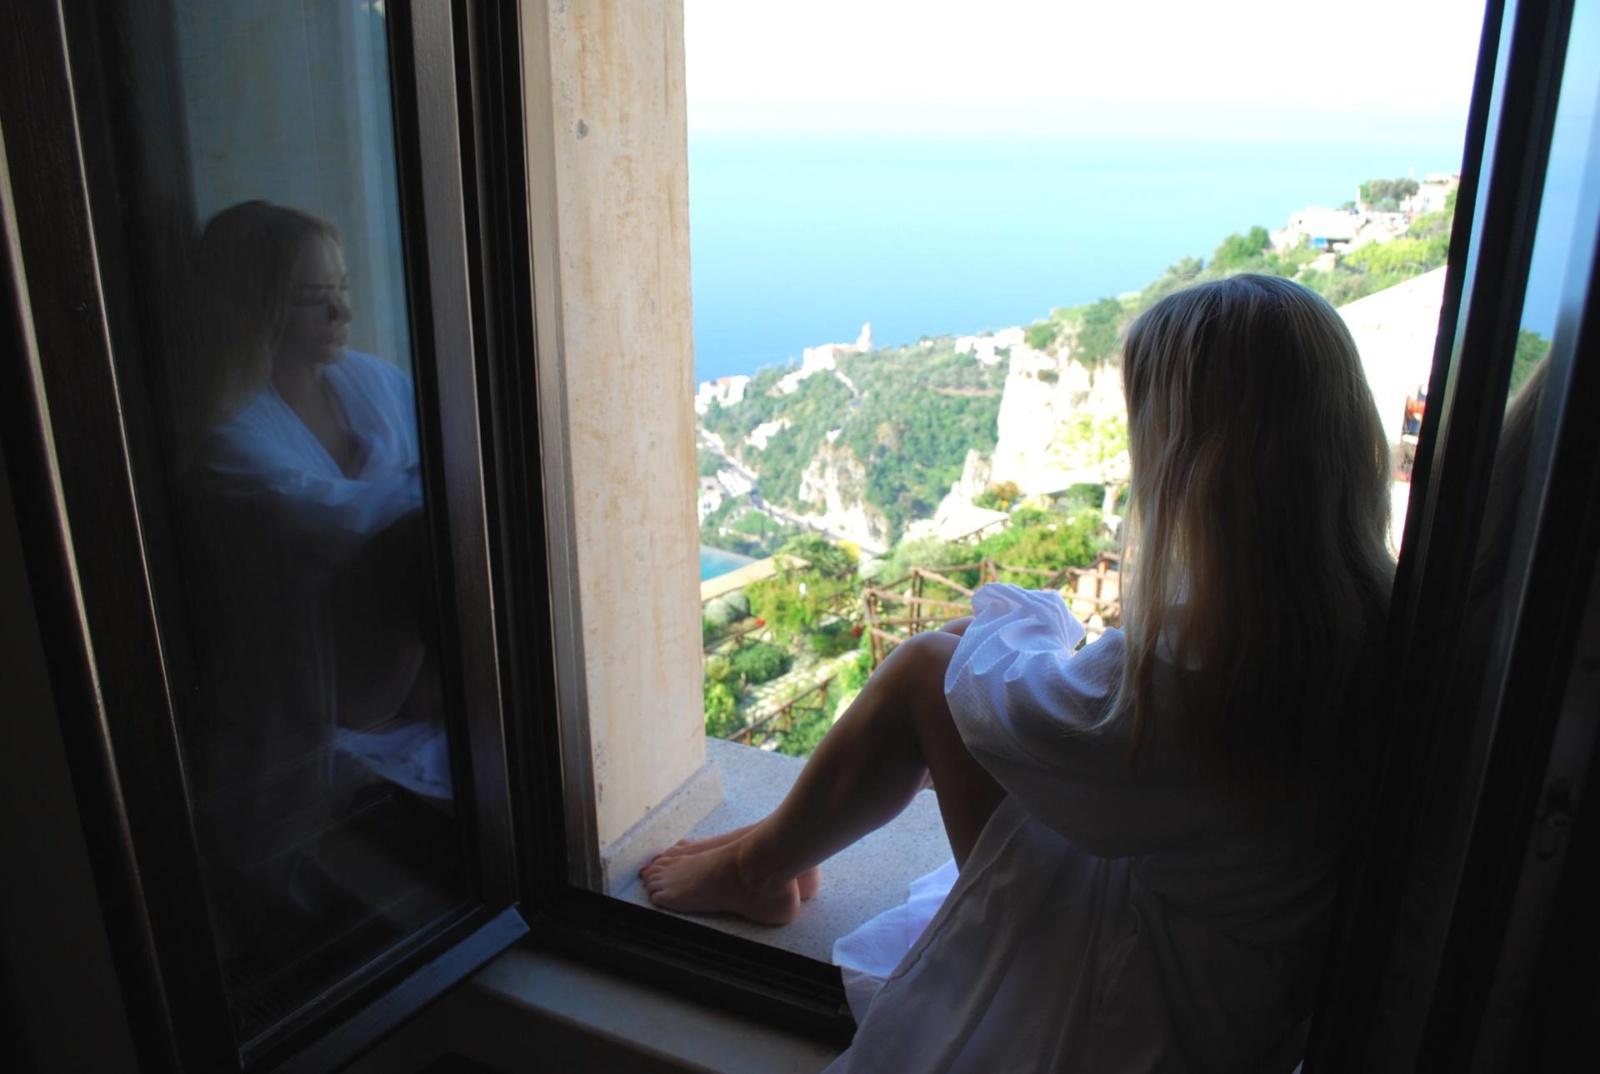 monastero-santa-rosa-amalfi-the-travelista-jess-gibson2